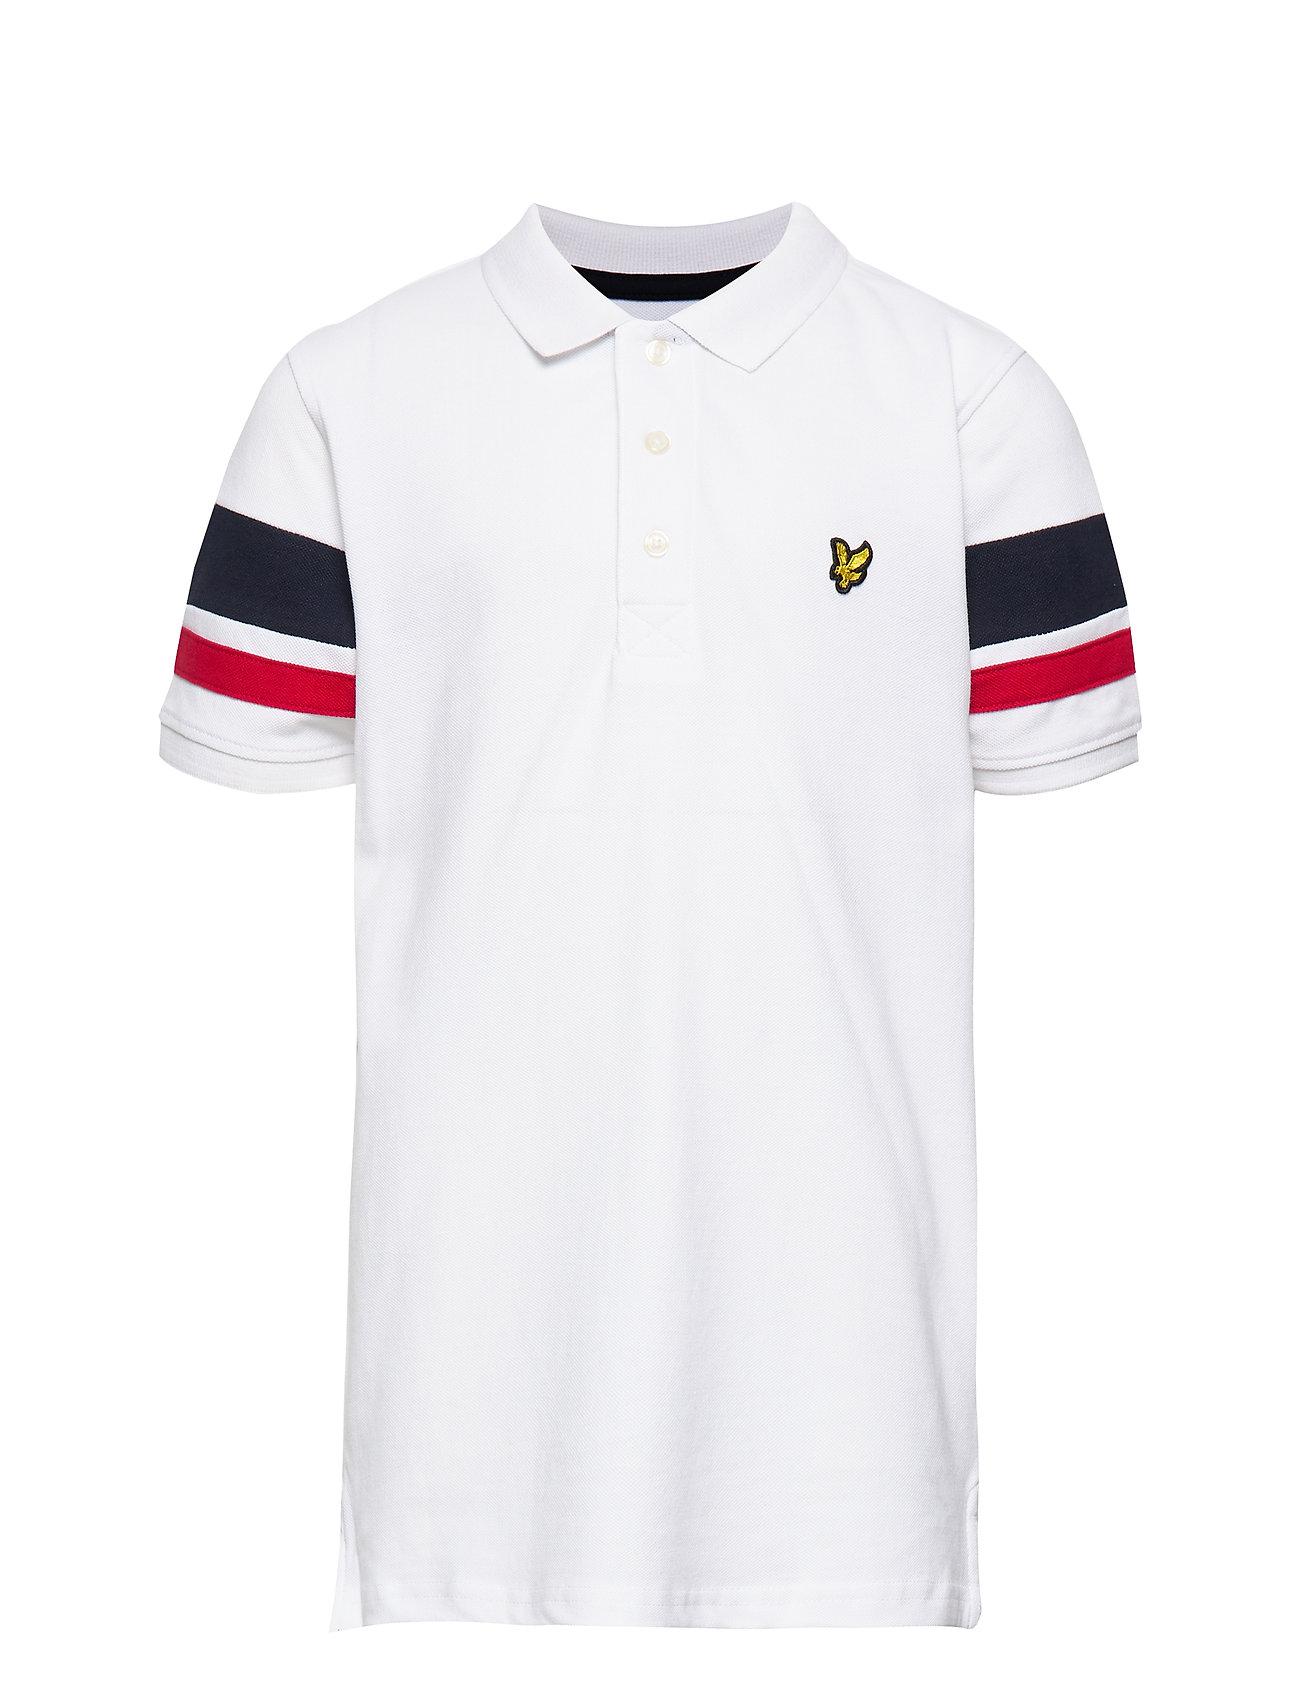 Lyle & Scott Junior Contrast Band Polo Shirt - BRIGHT WHITE